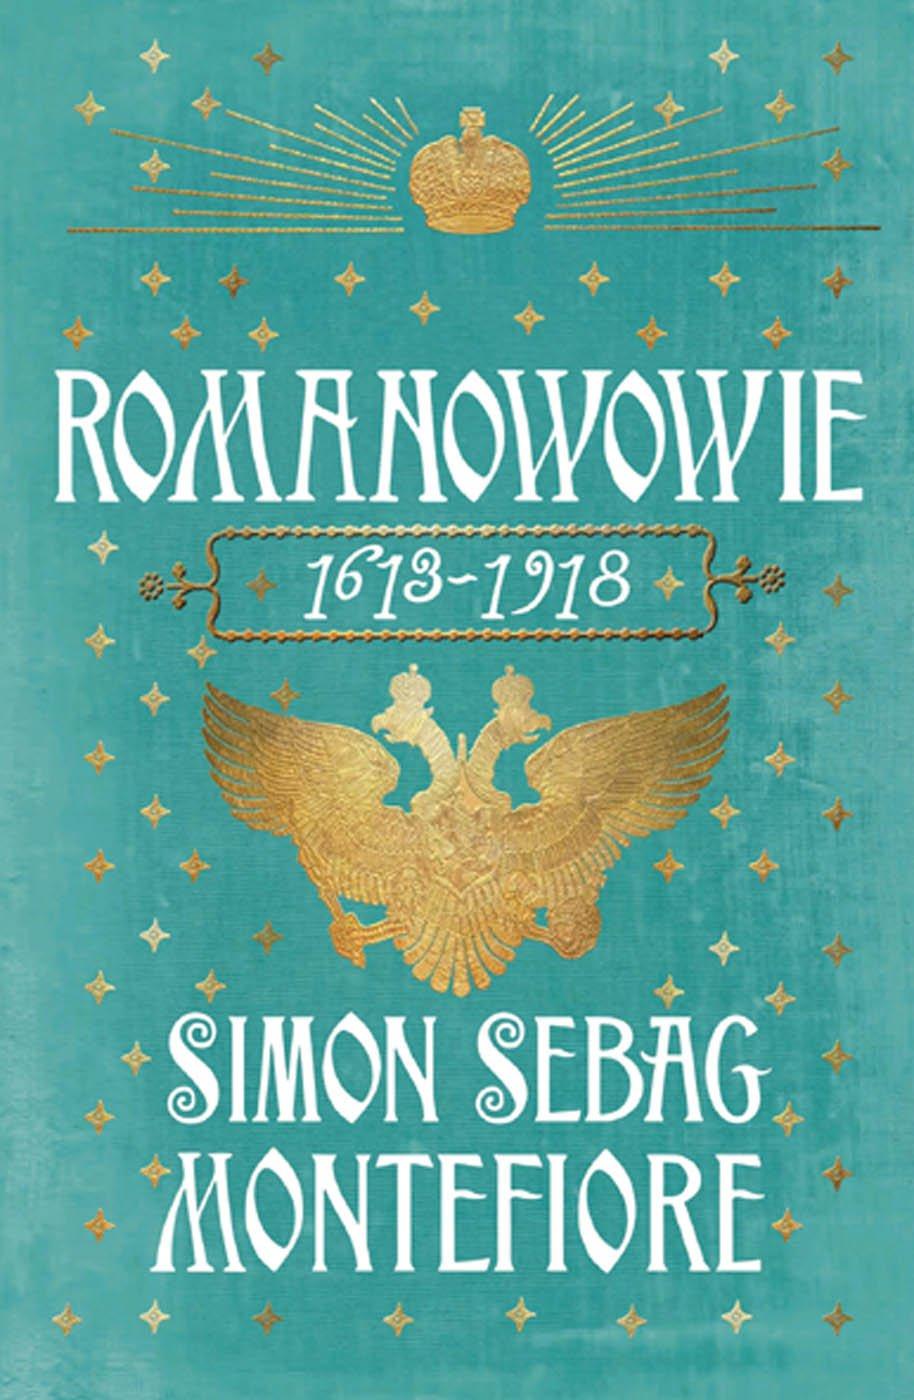 Romanowowie - Simon Sebag Montefiore